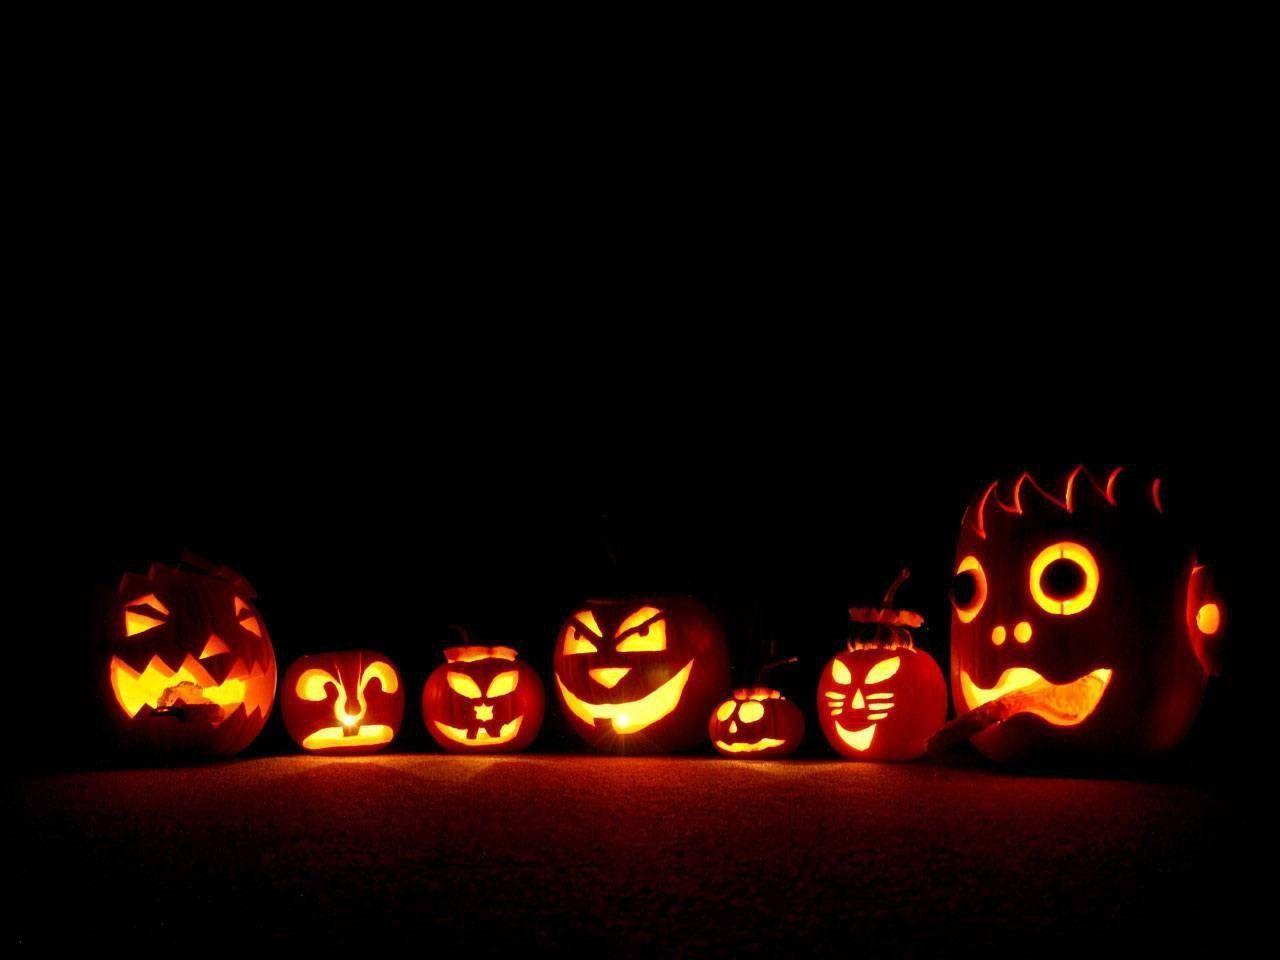 free halloween desktop wallpaper ahd images - Desktop Wallpaper Halloween